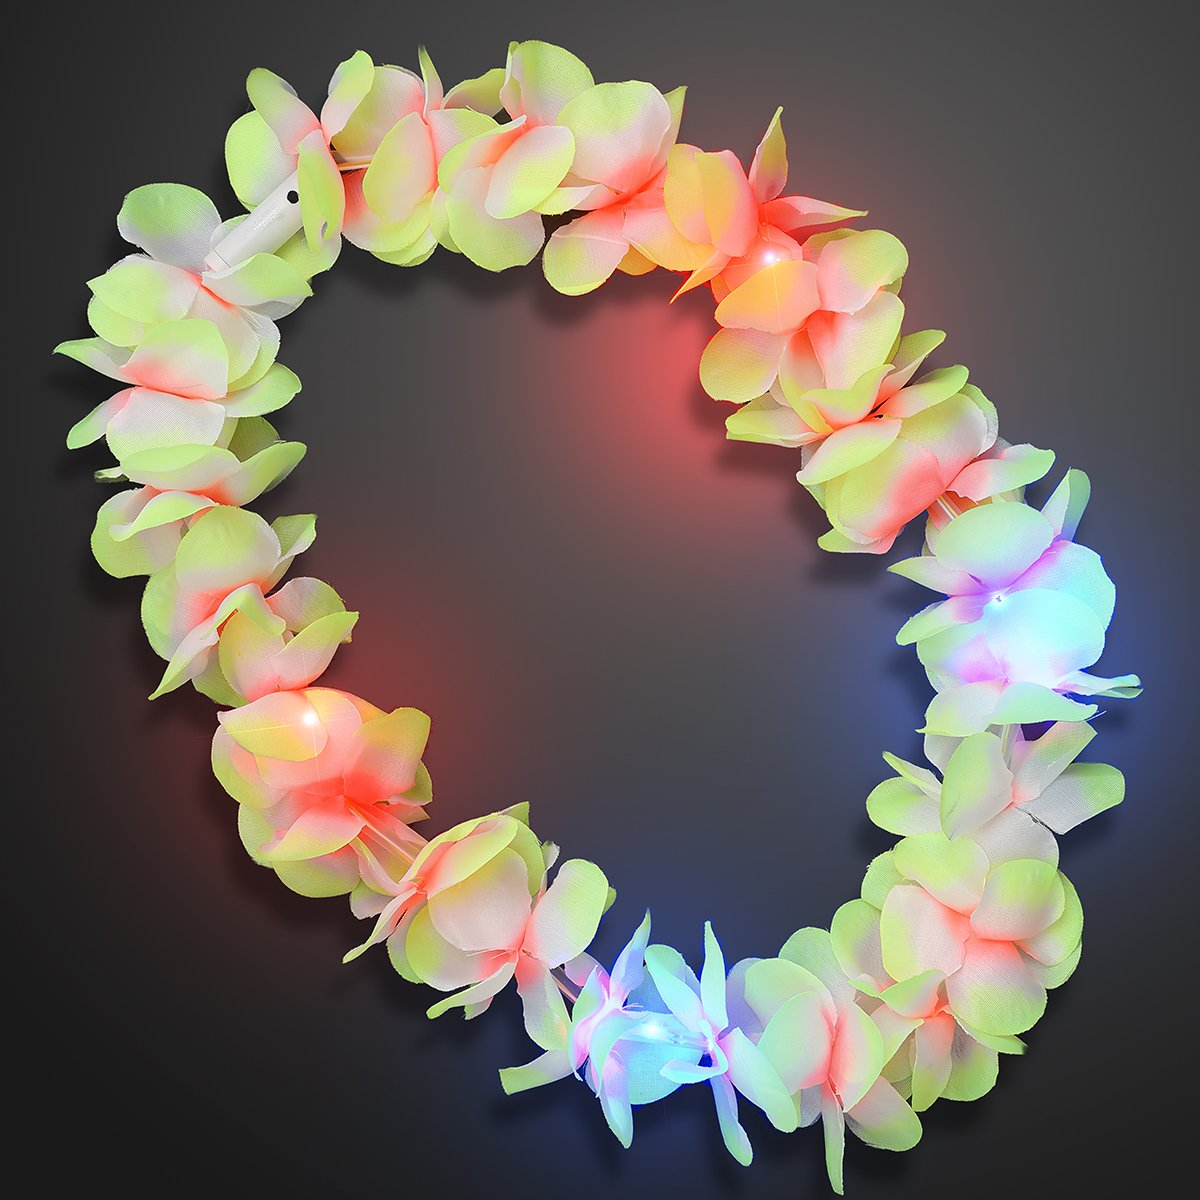 Large Assorted Light Up Hawaiian Leis with Flashing LED Lights (Set of 24) by FlashingBlinkyLights (Image #7)